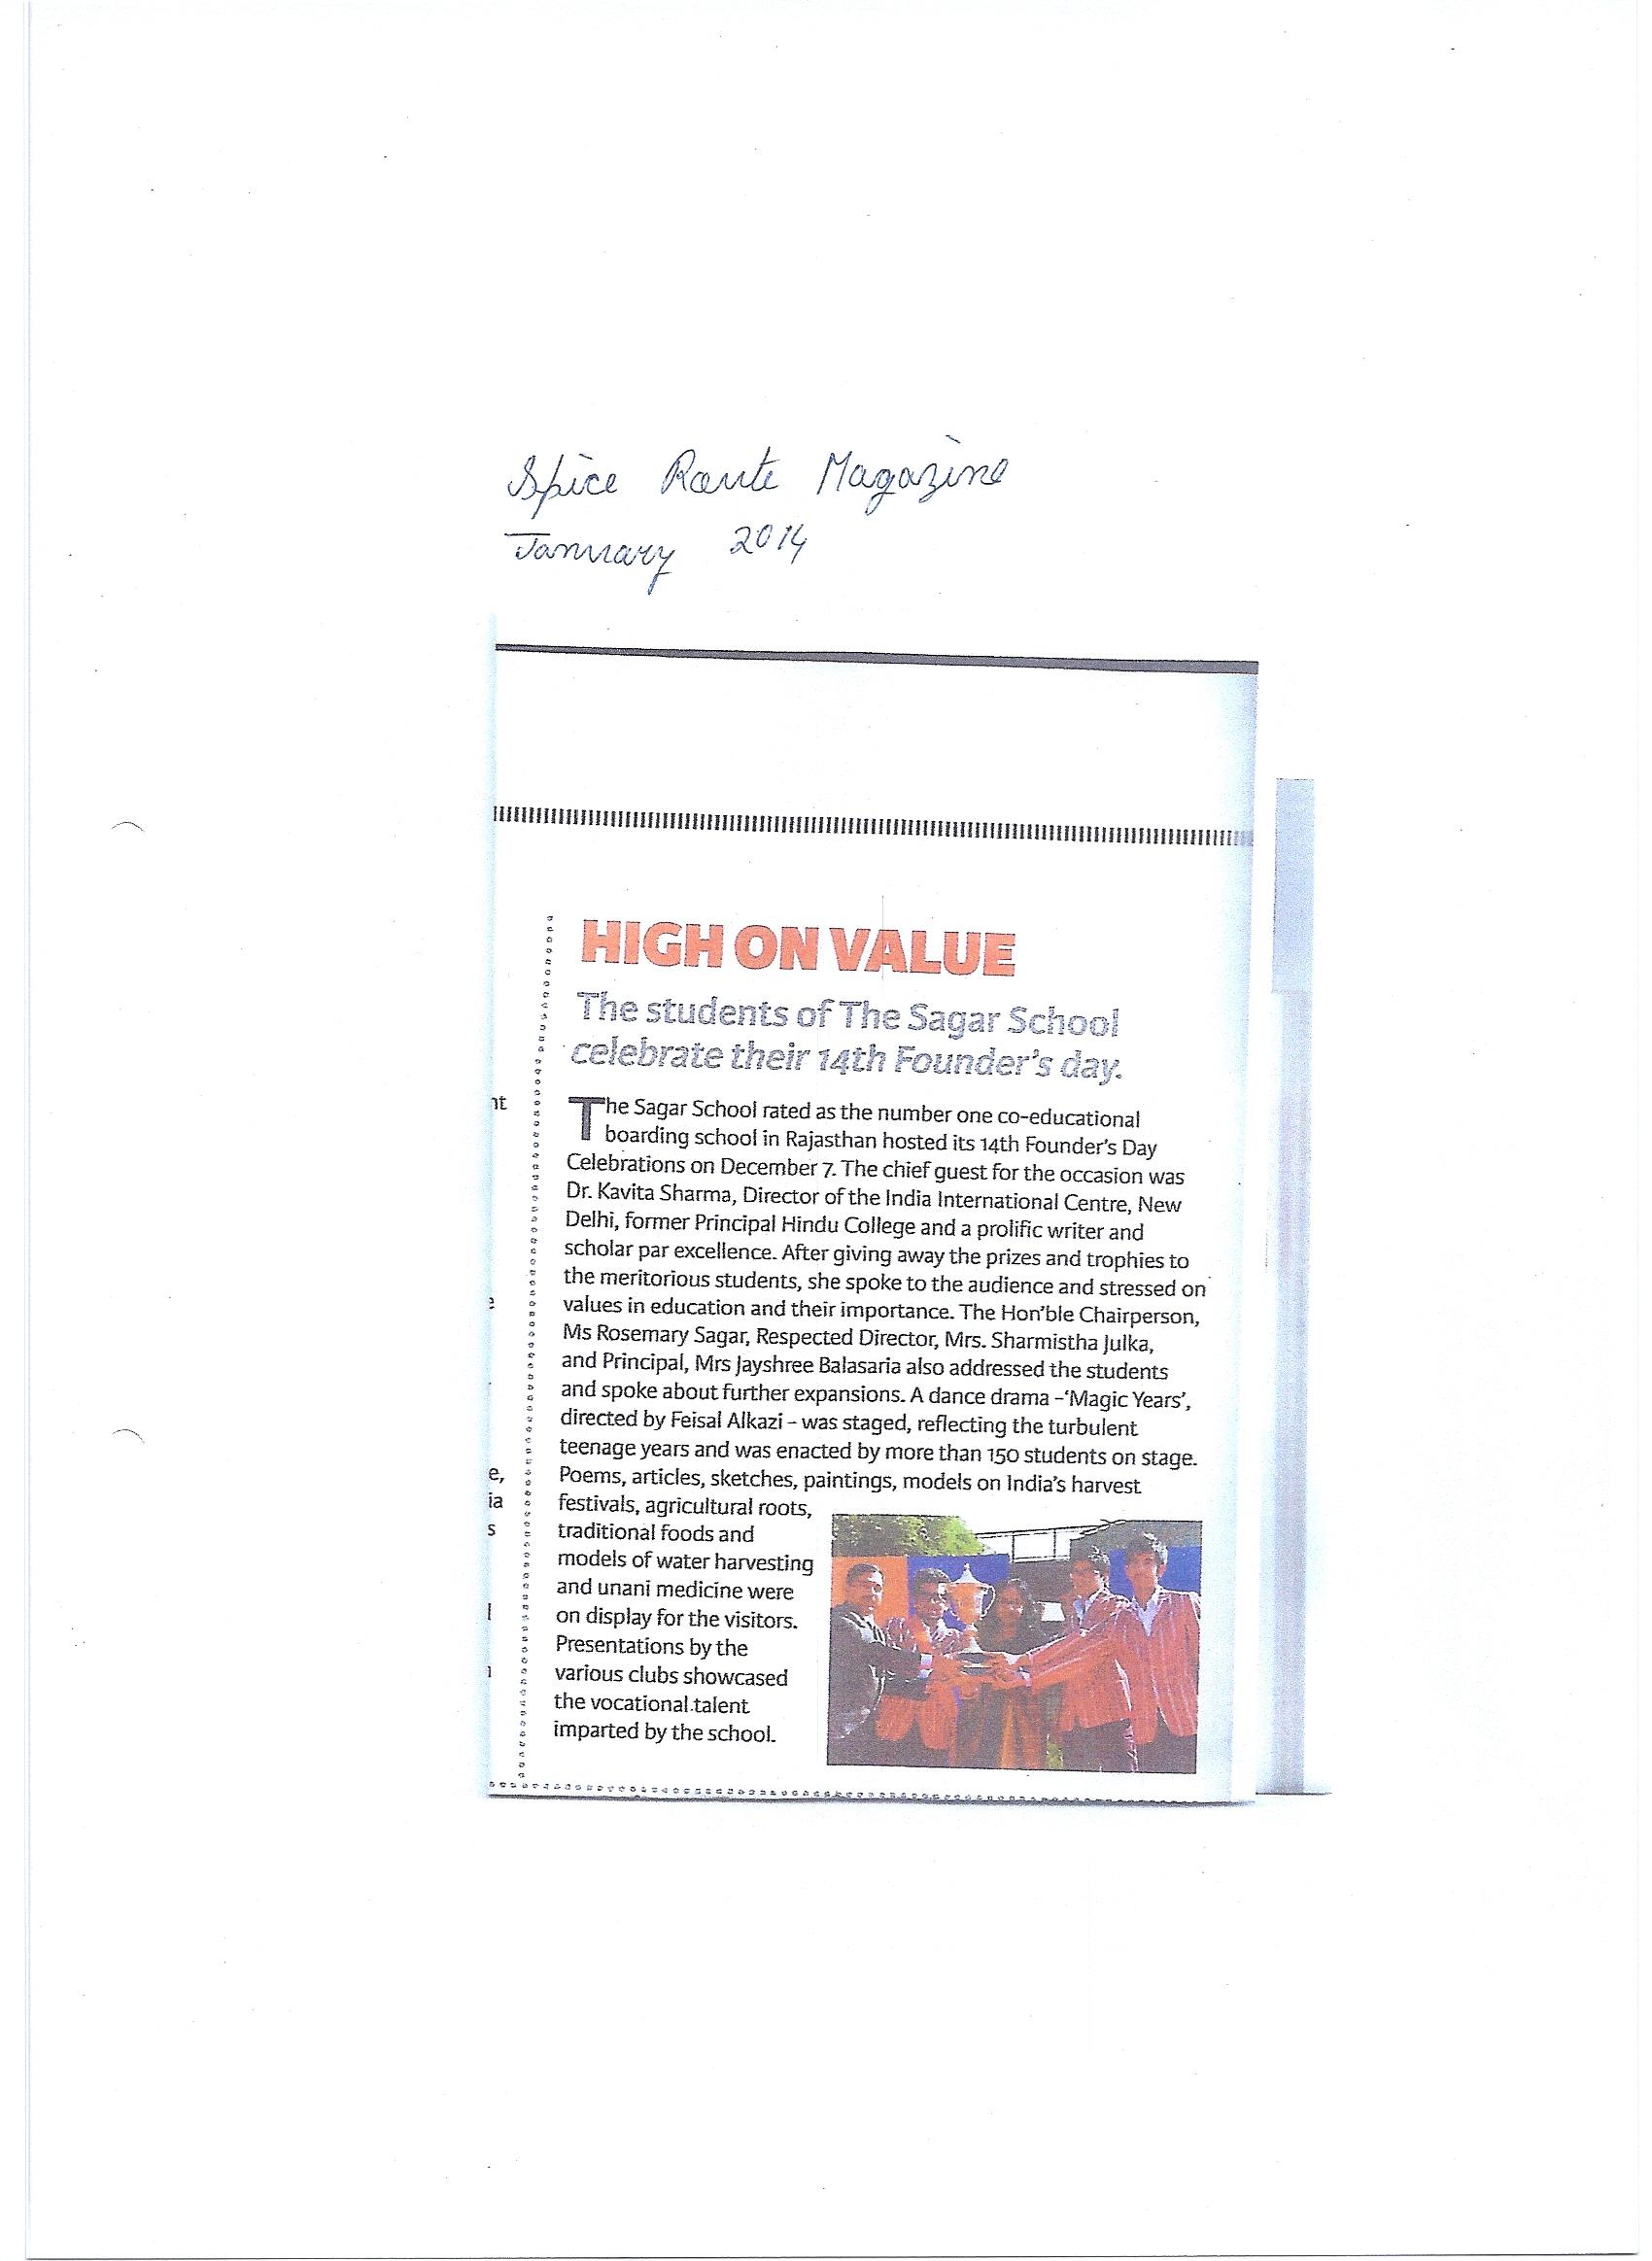 The Sagar School News Press Releases